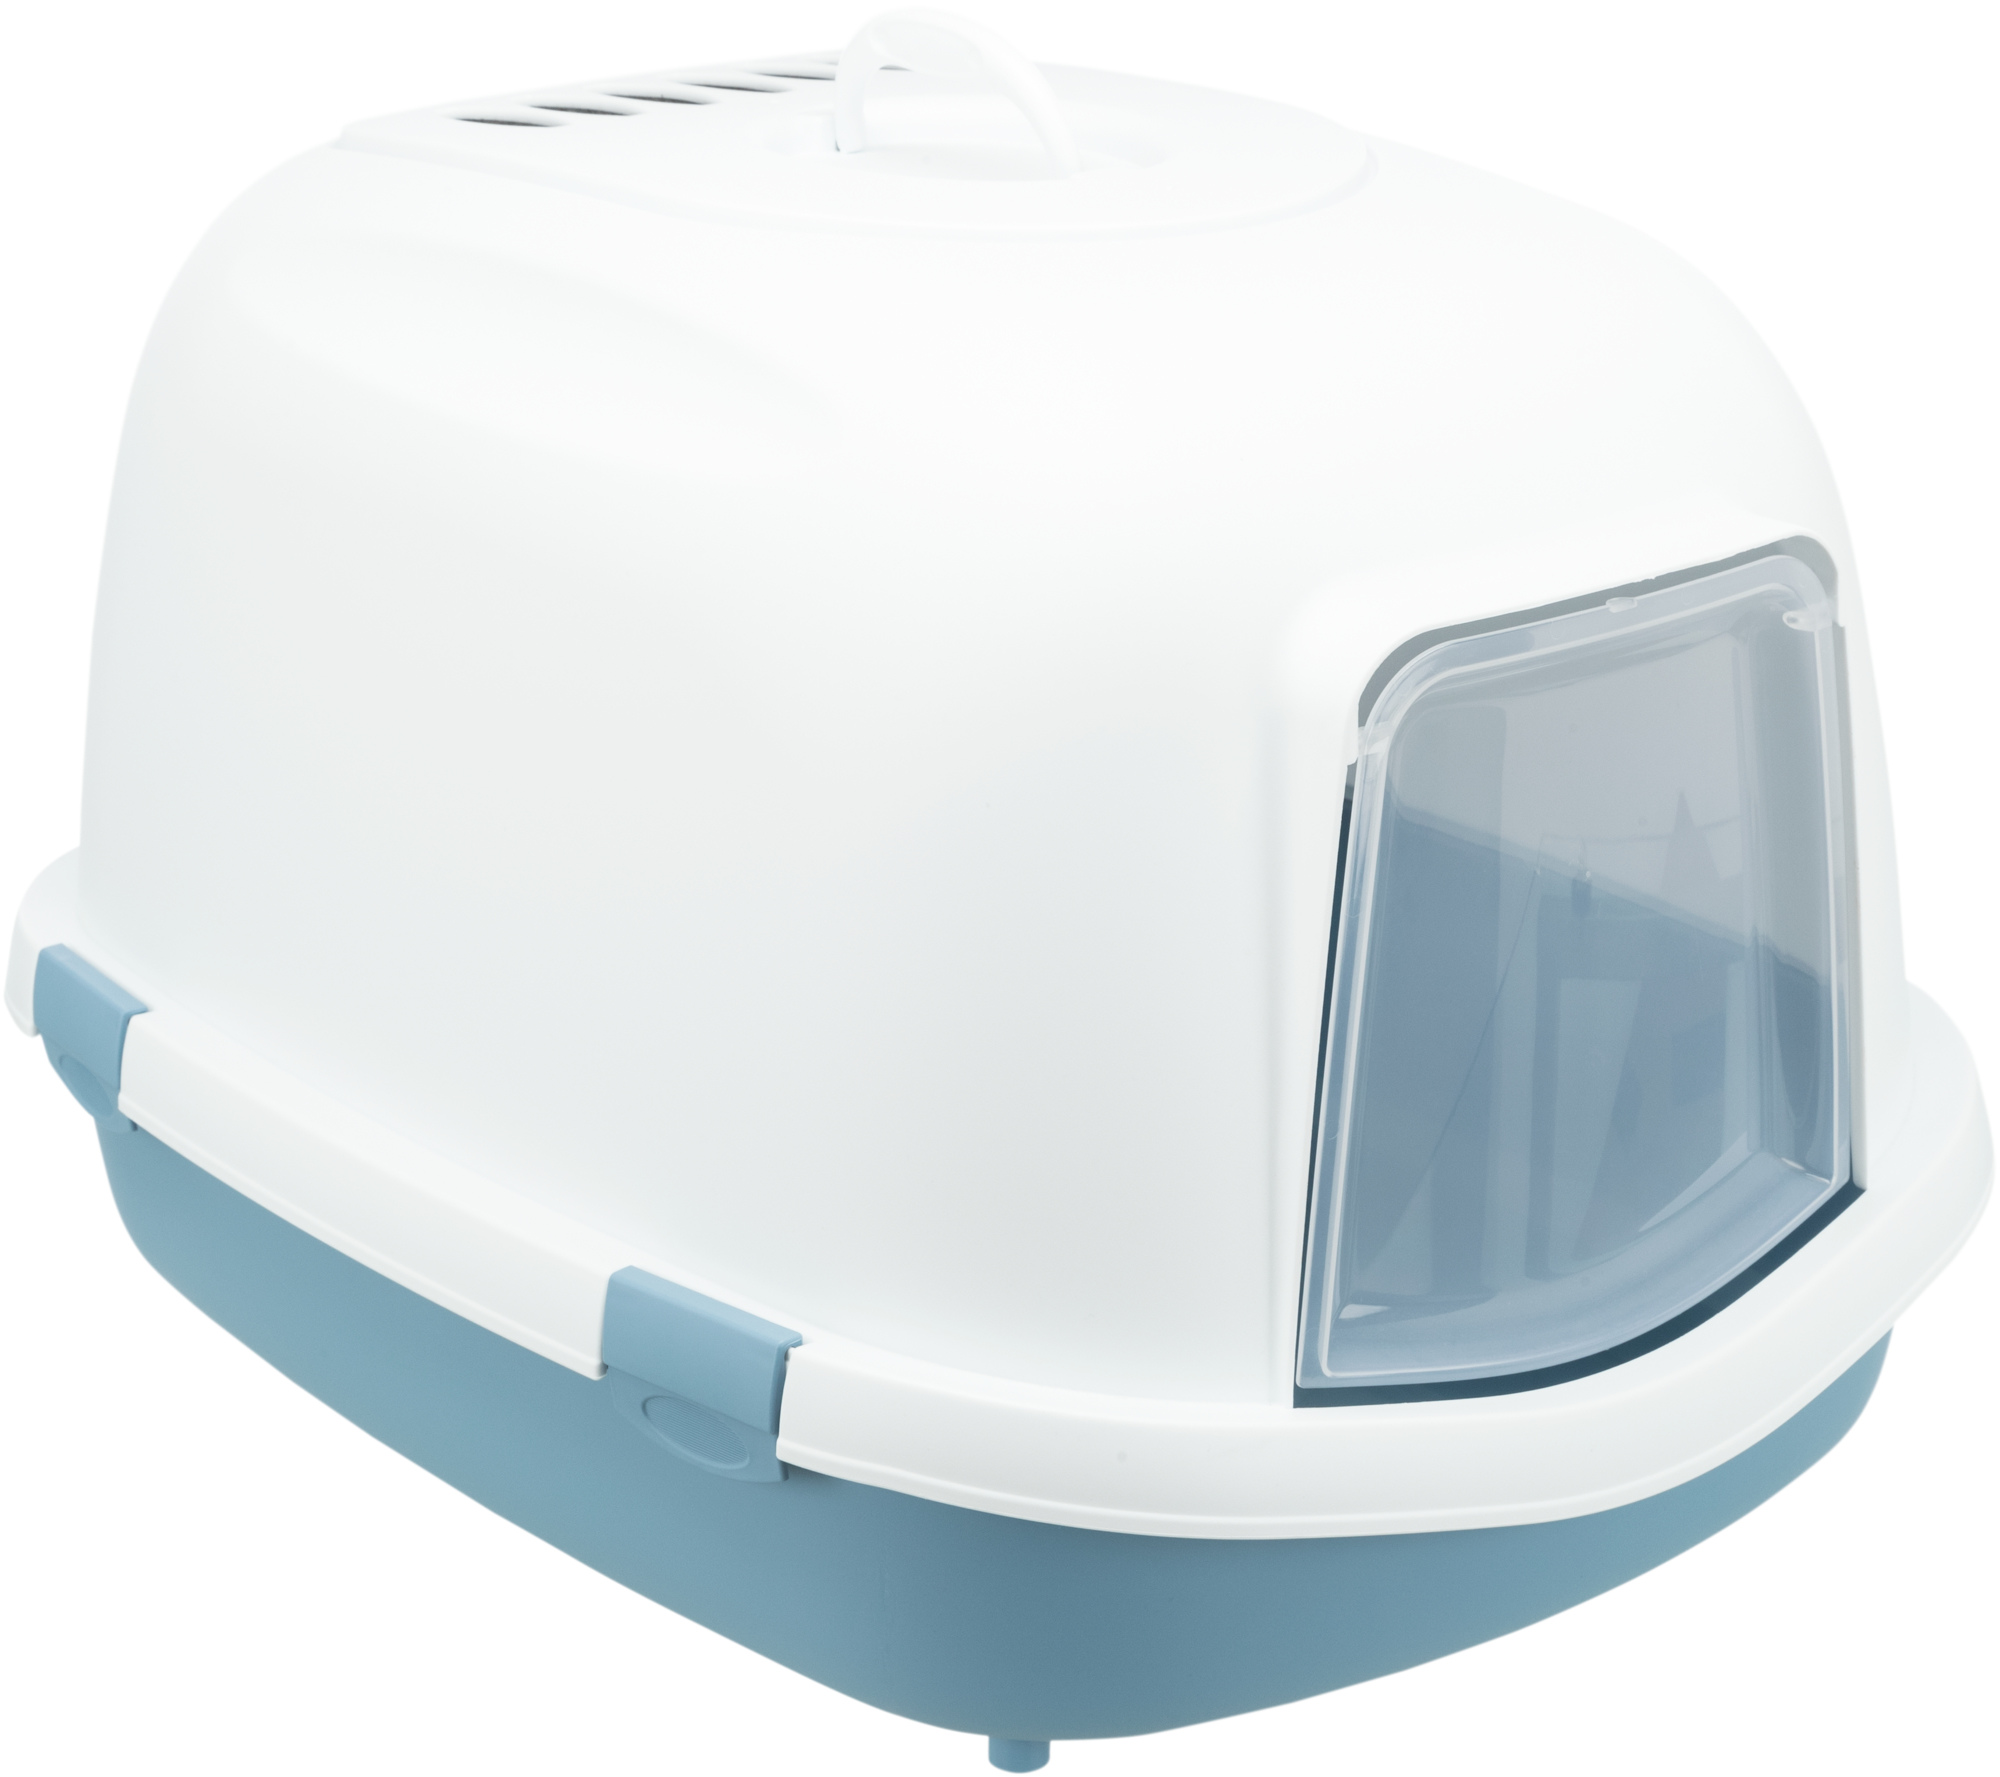 TRIXIE Katzentoilette Primo XXL Top, mit Haube TRIXIE Katzentoilette Primo XXL Top, mit Haube, 56 × 47 × 71 cm, blau/weiß